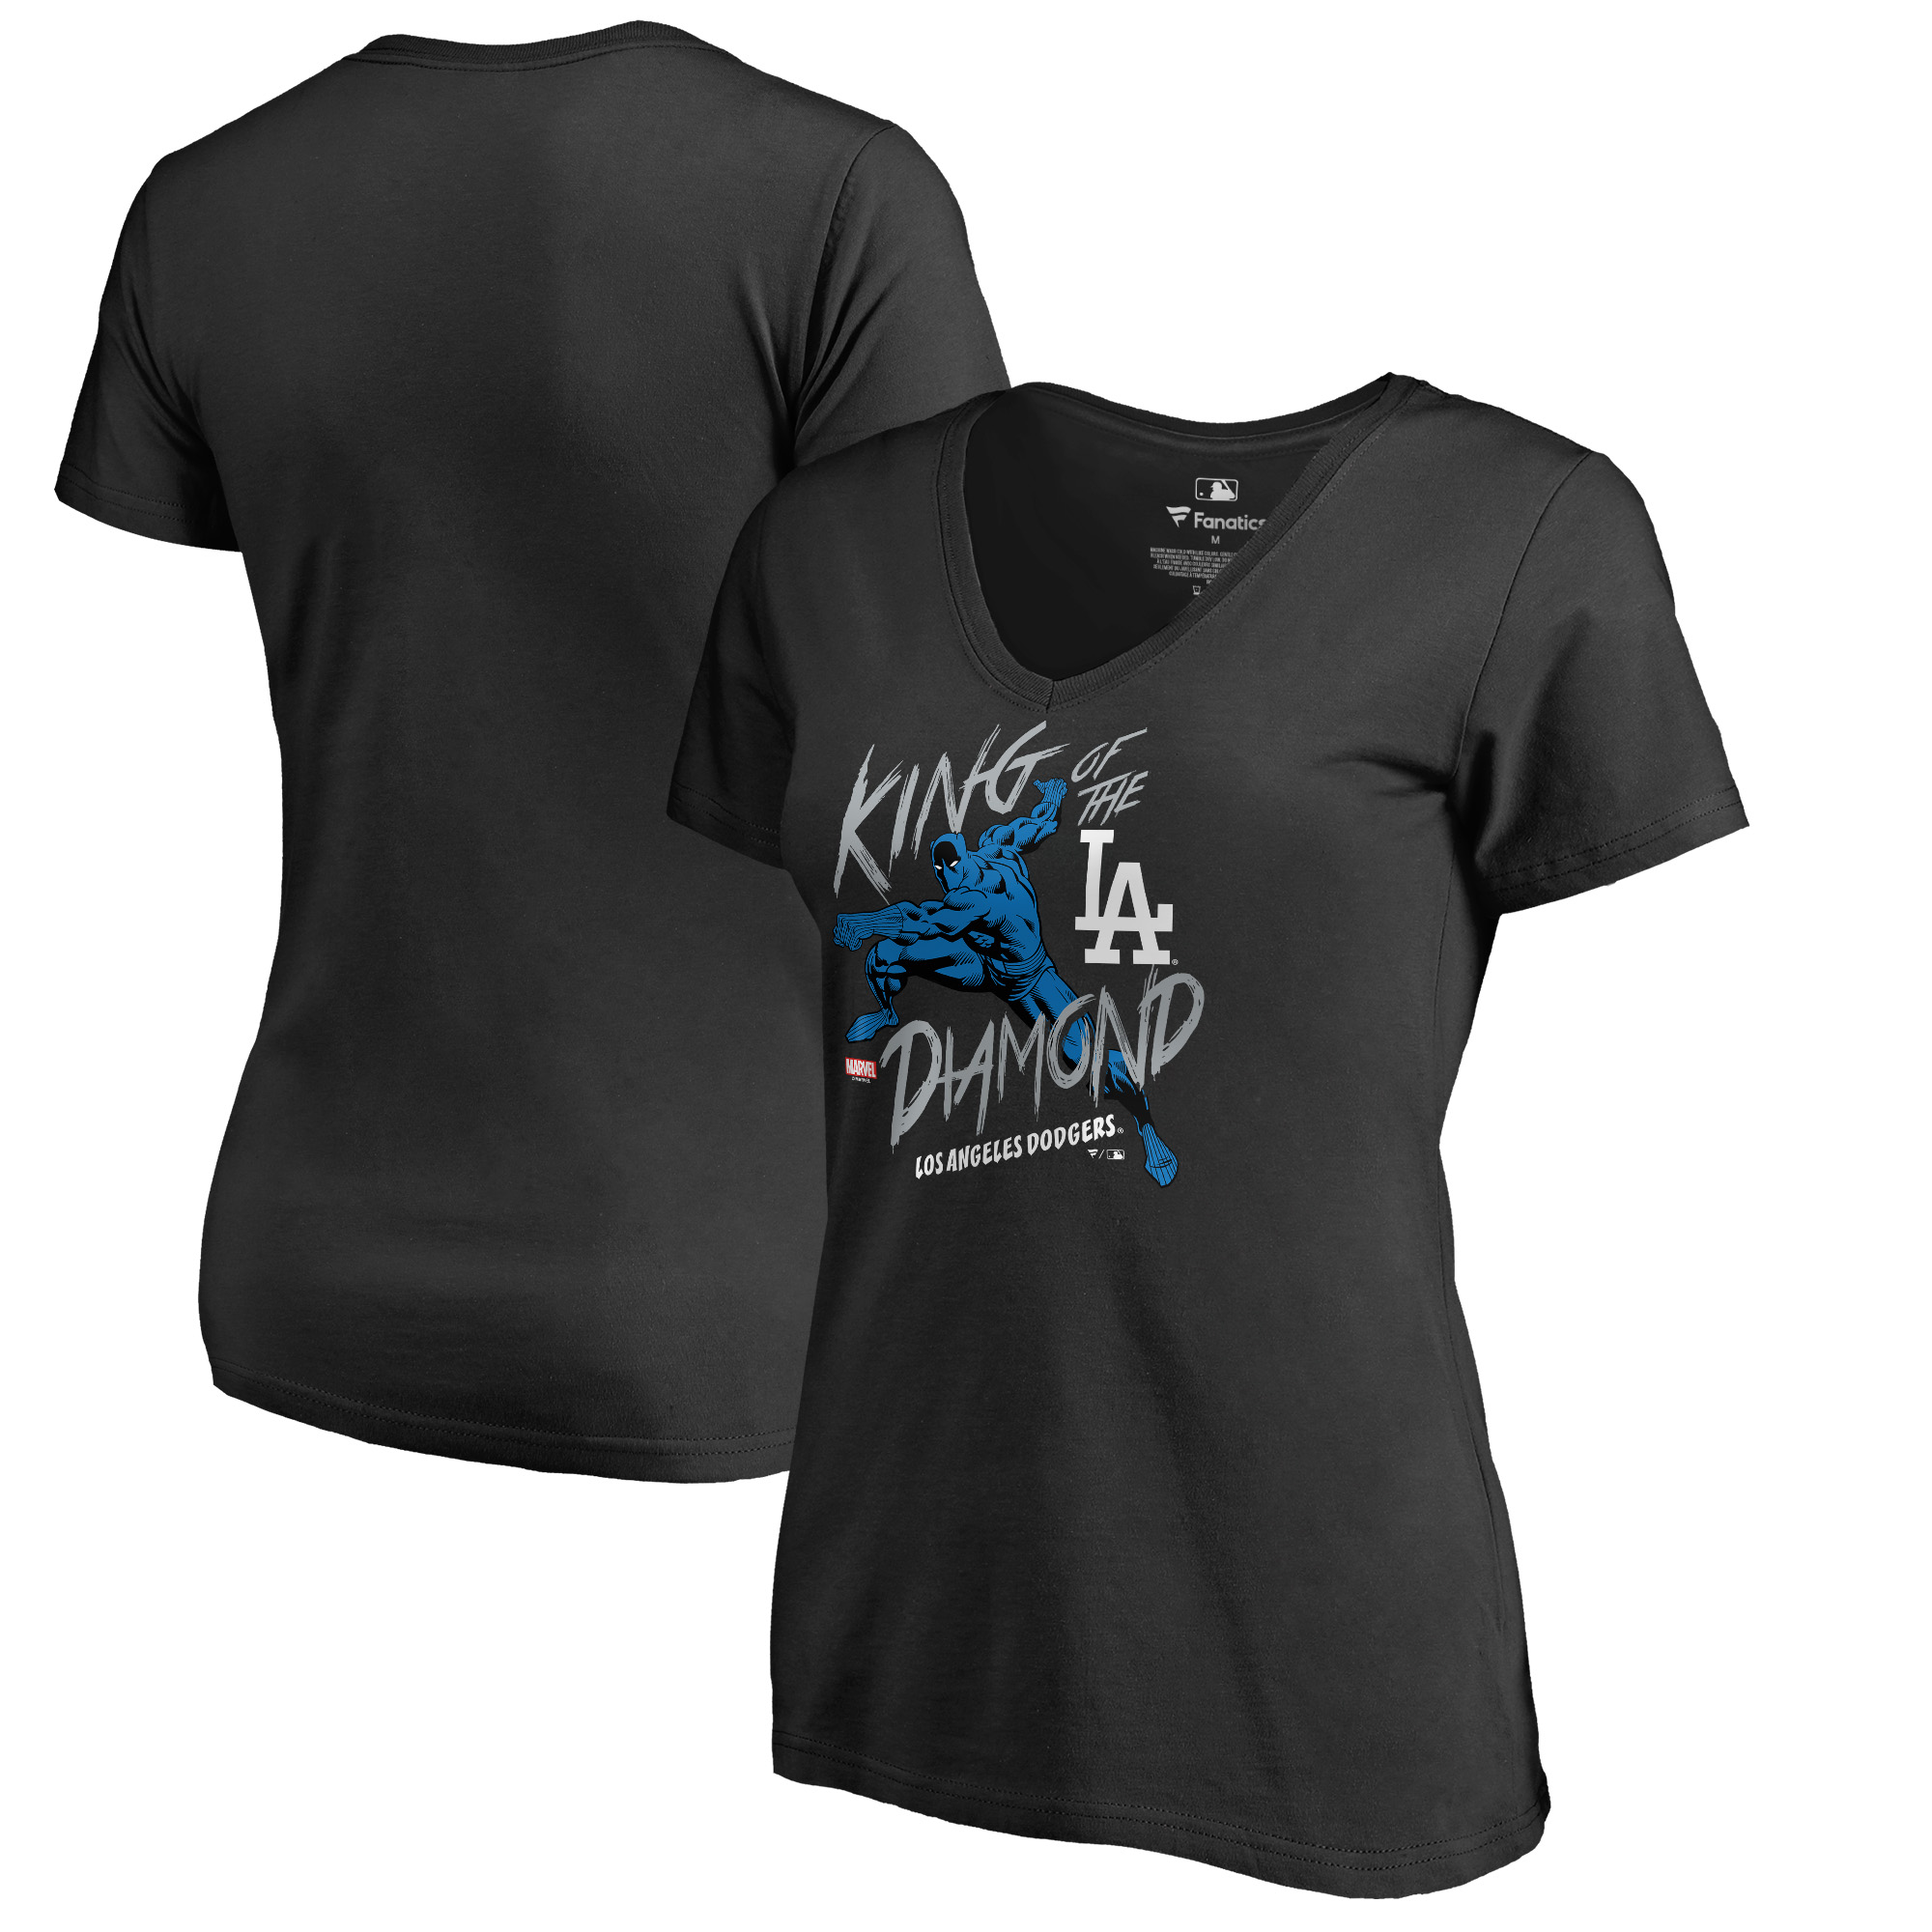 Los Angeles Dodgers Fanatics Branded Women's MLB Marvel Black Panther King of the Diamond V-Neck T-Shirt - Black